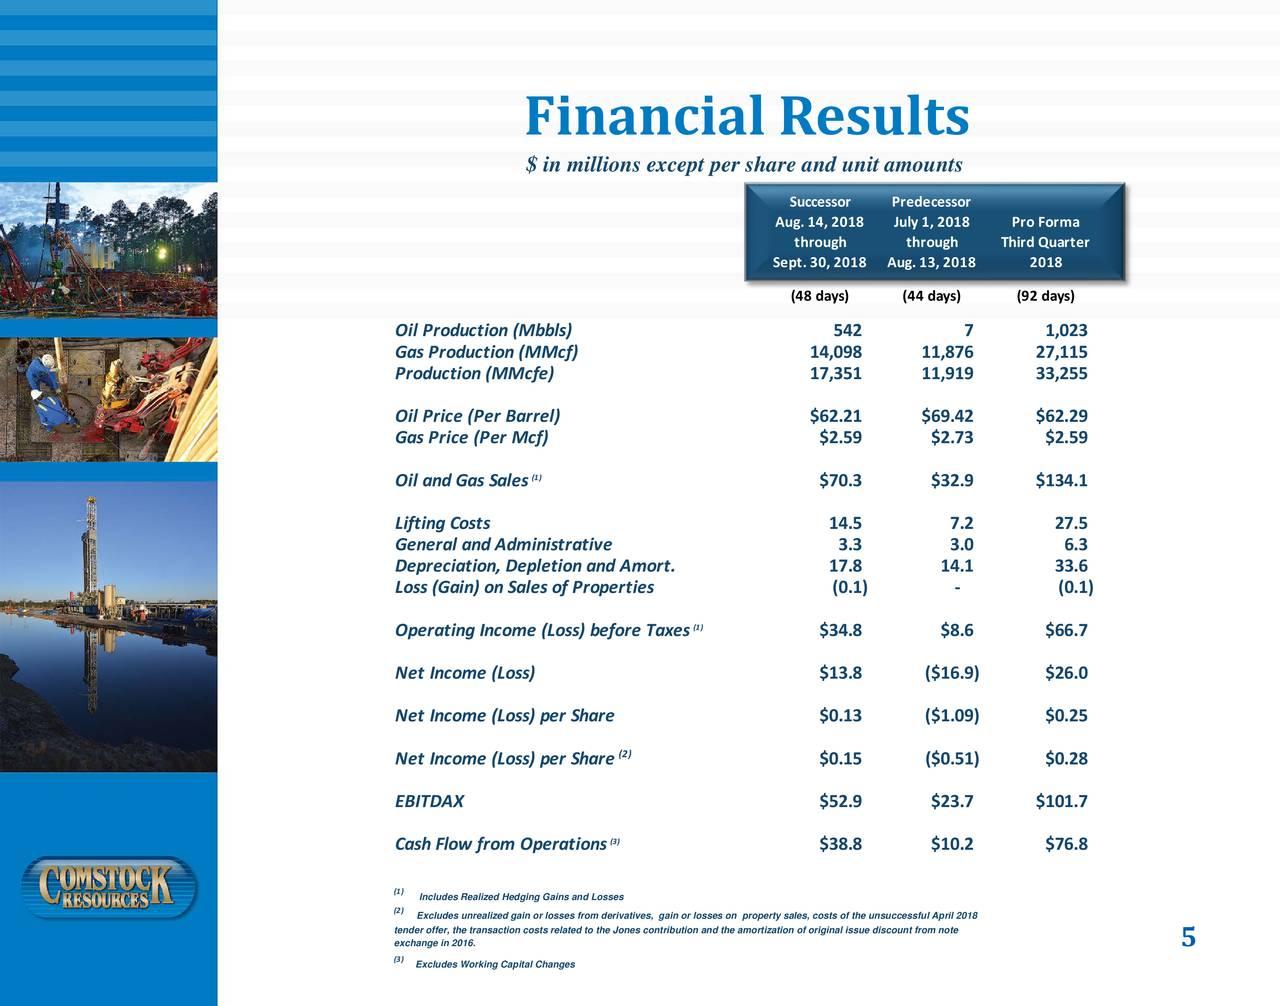 Comstock Resources Inc. 2018 Q3